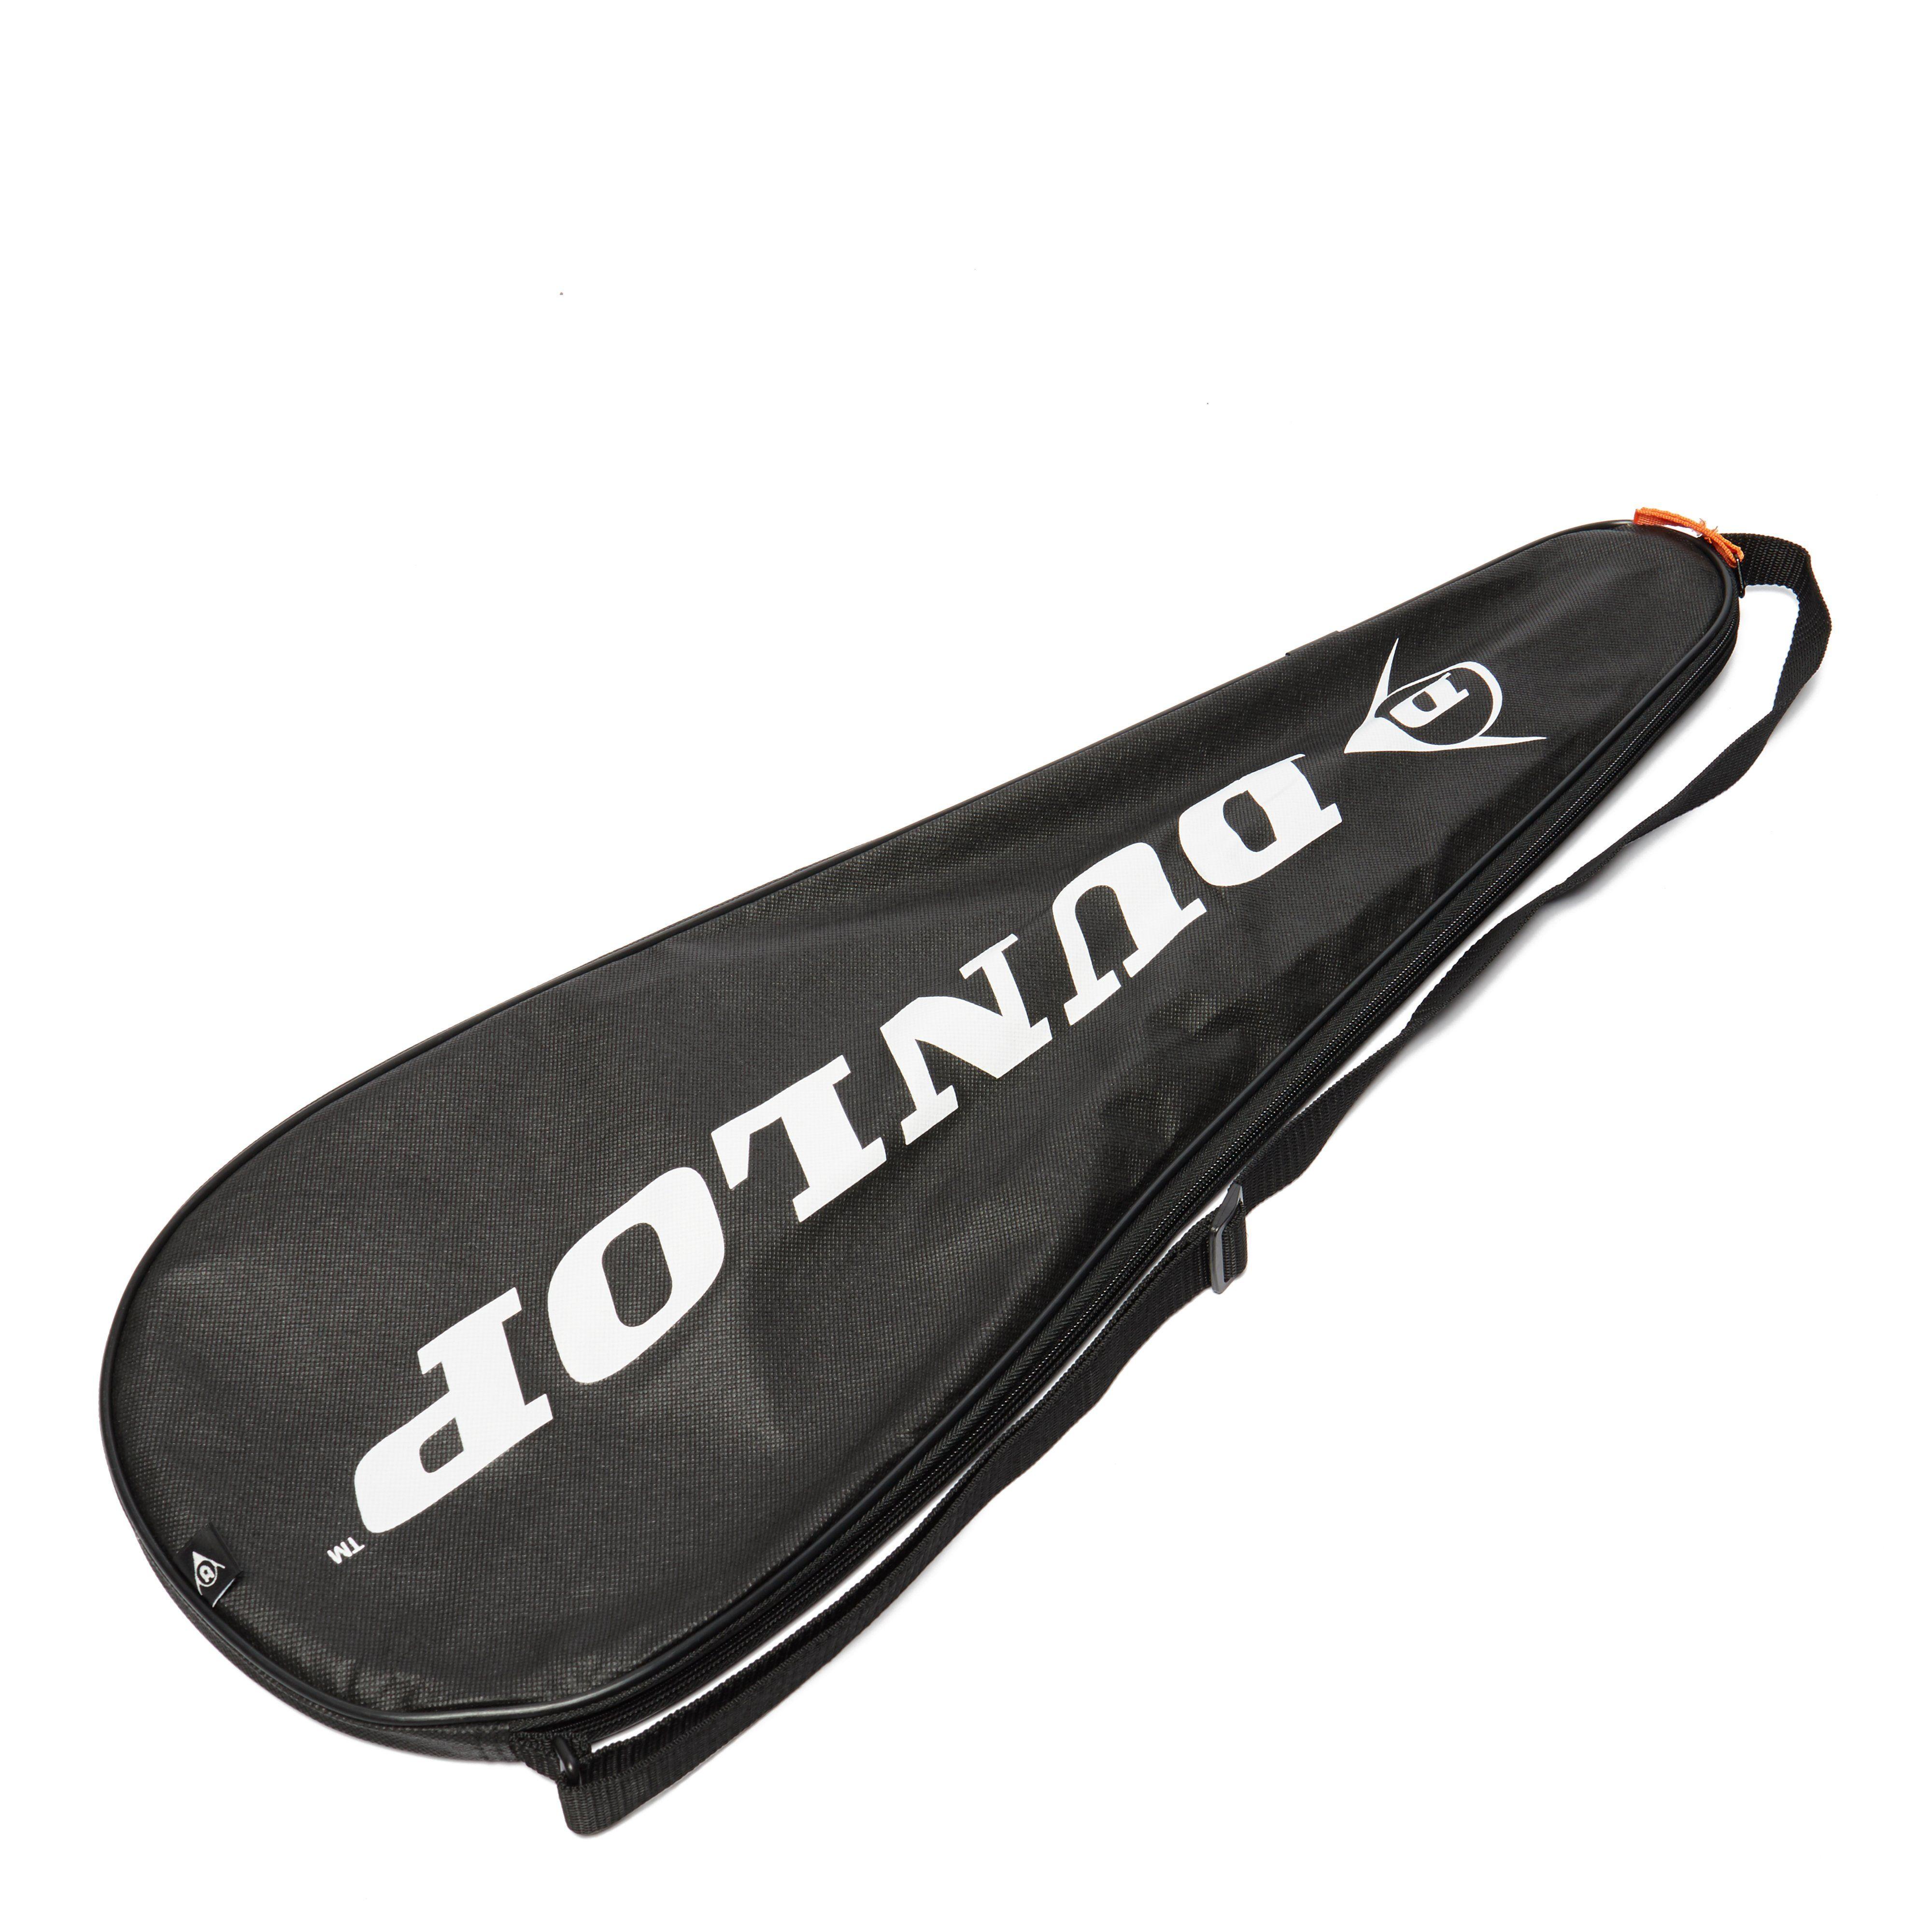 Dunlop Blackstorm Titanium 3.0 Squash Racket